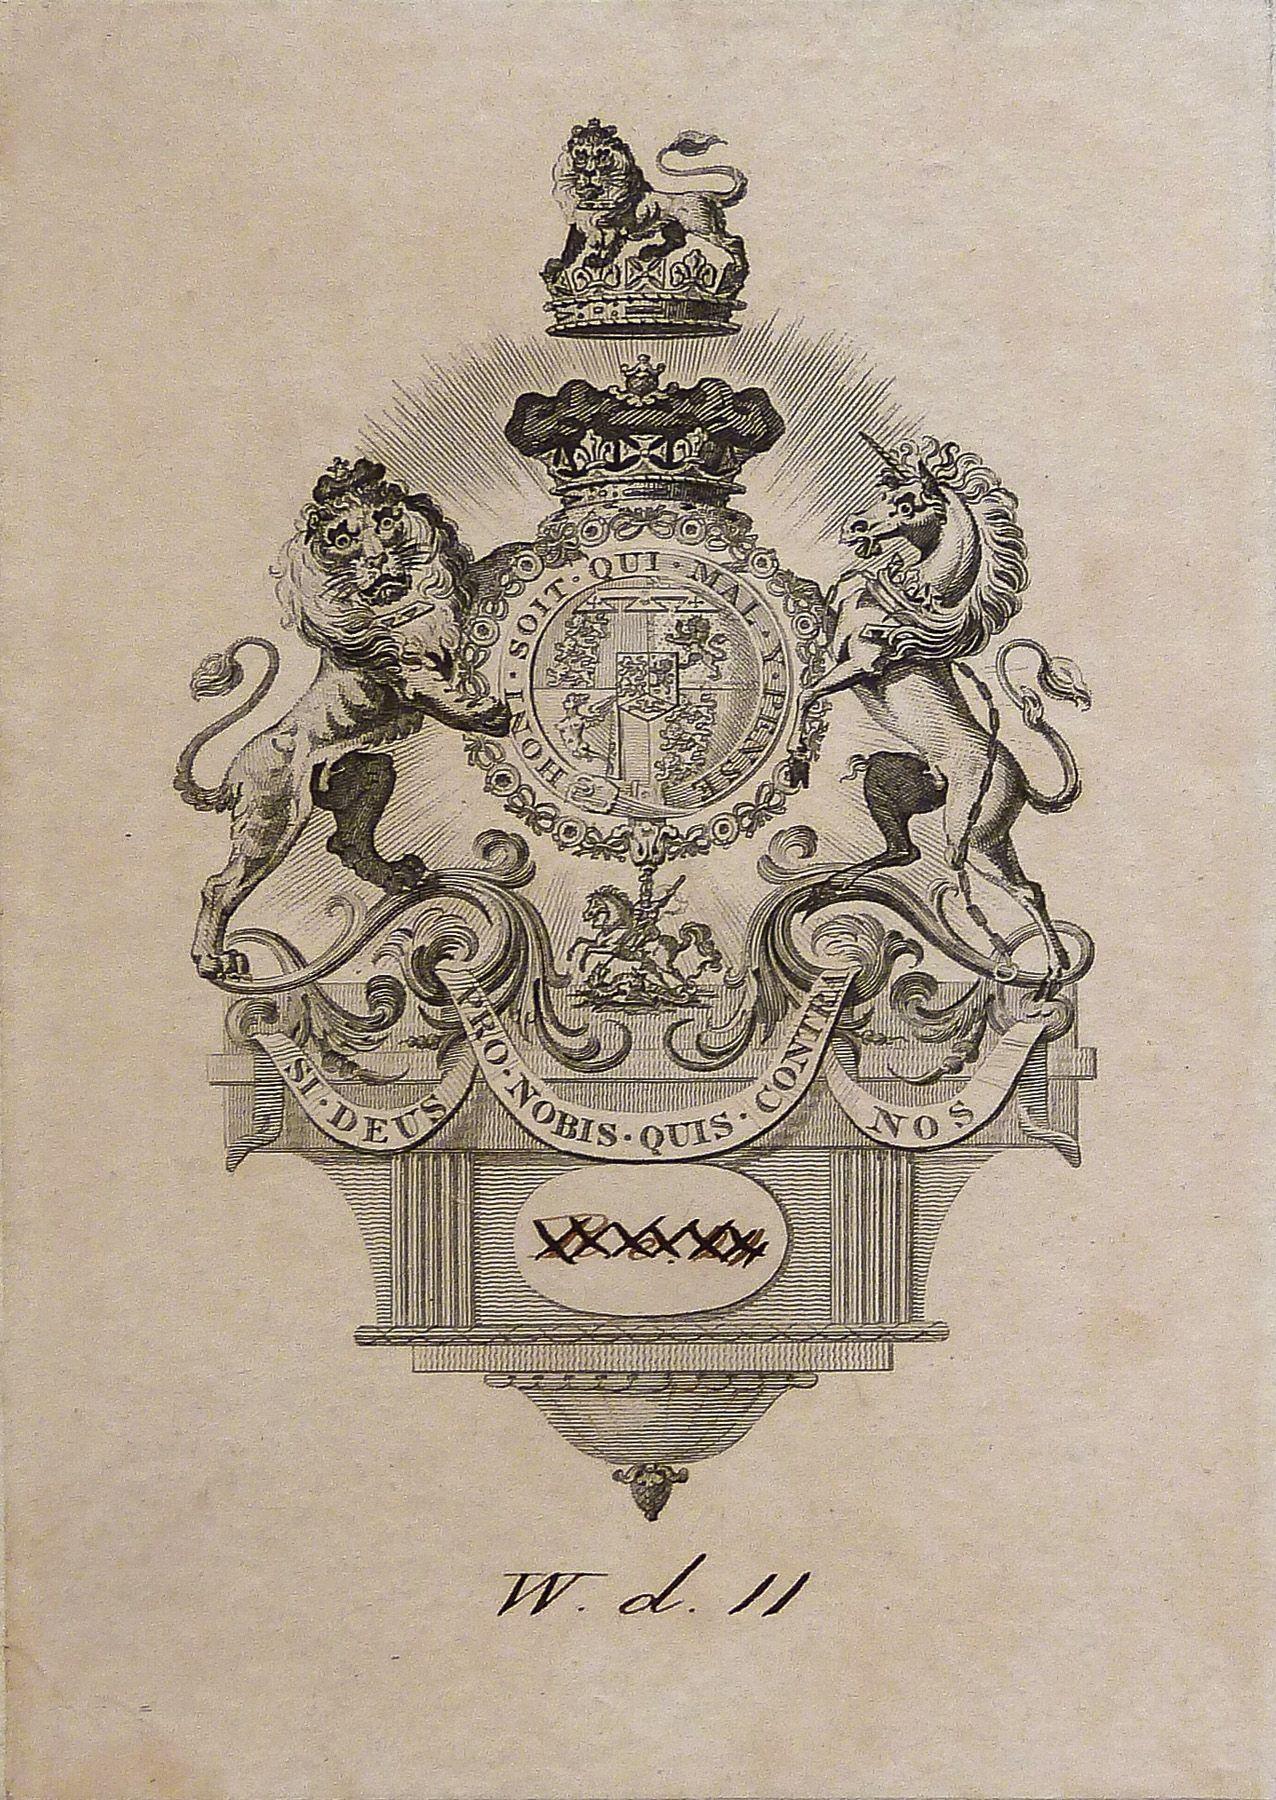 Armorial bookplate of prince augustus frederick duke of